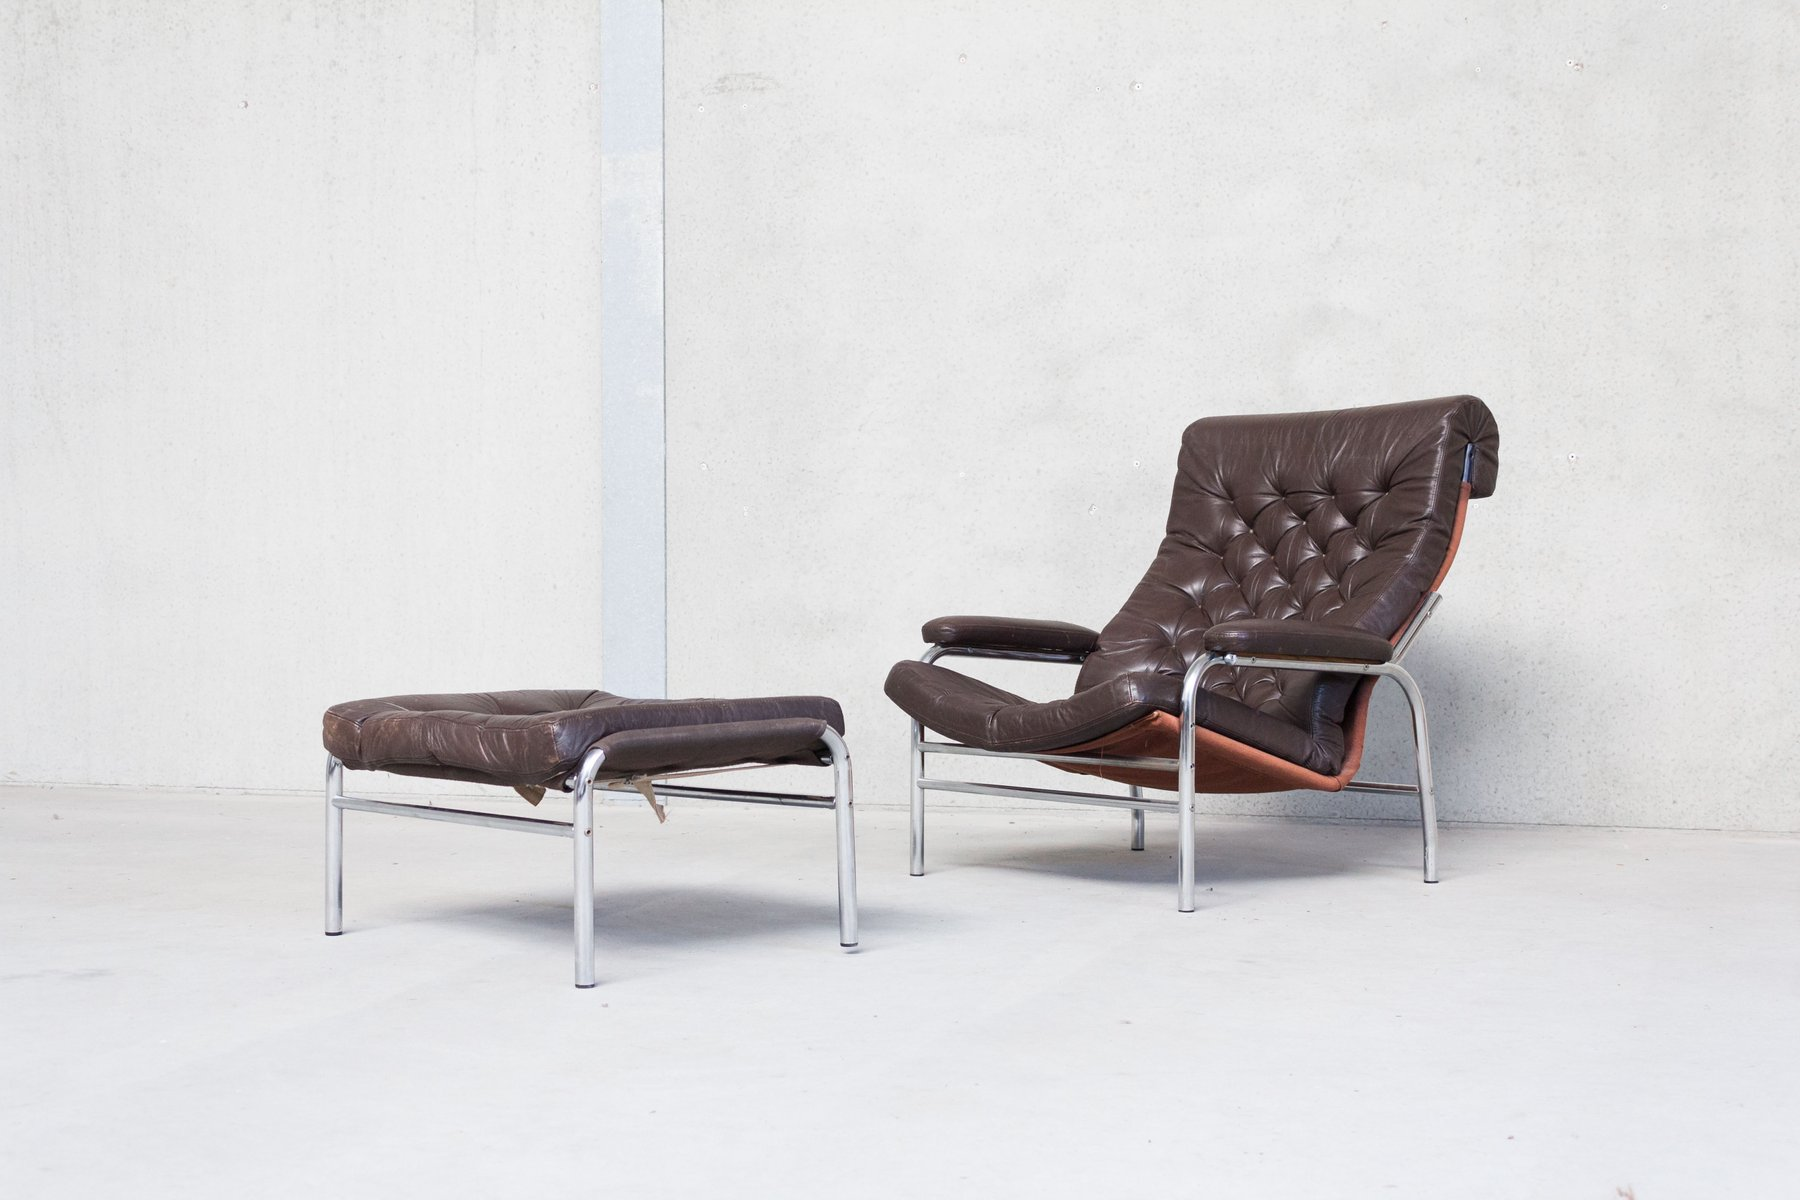 Tavolo In Teak Ikea : Mid century bore chair with ottoman by noburu nakamure for ikea